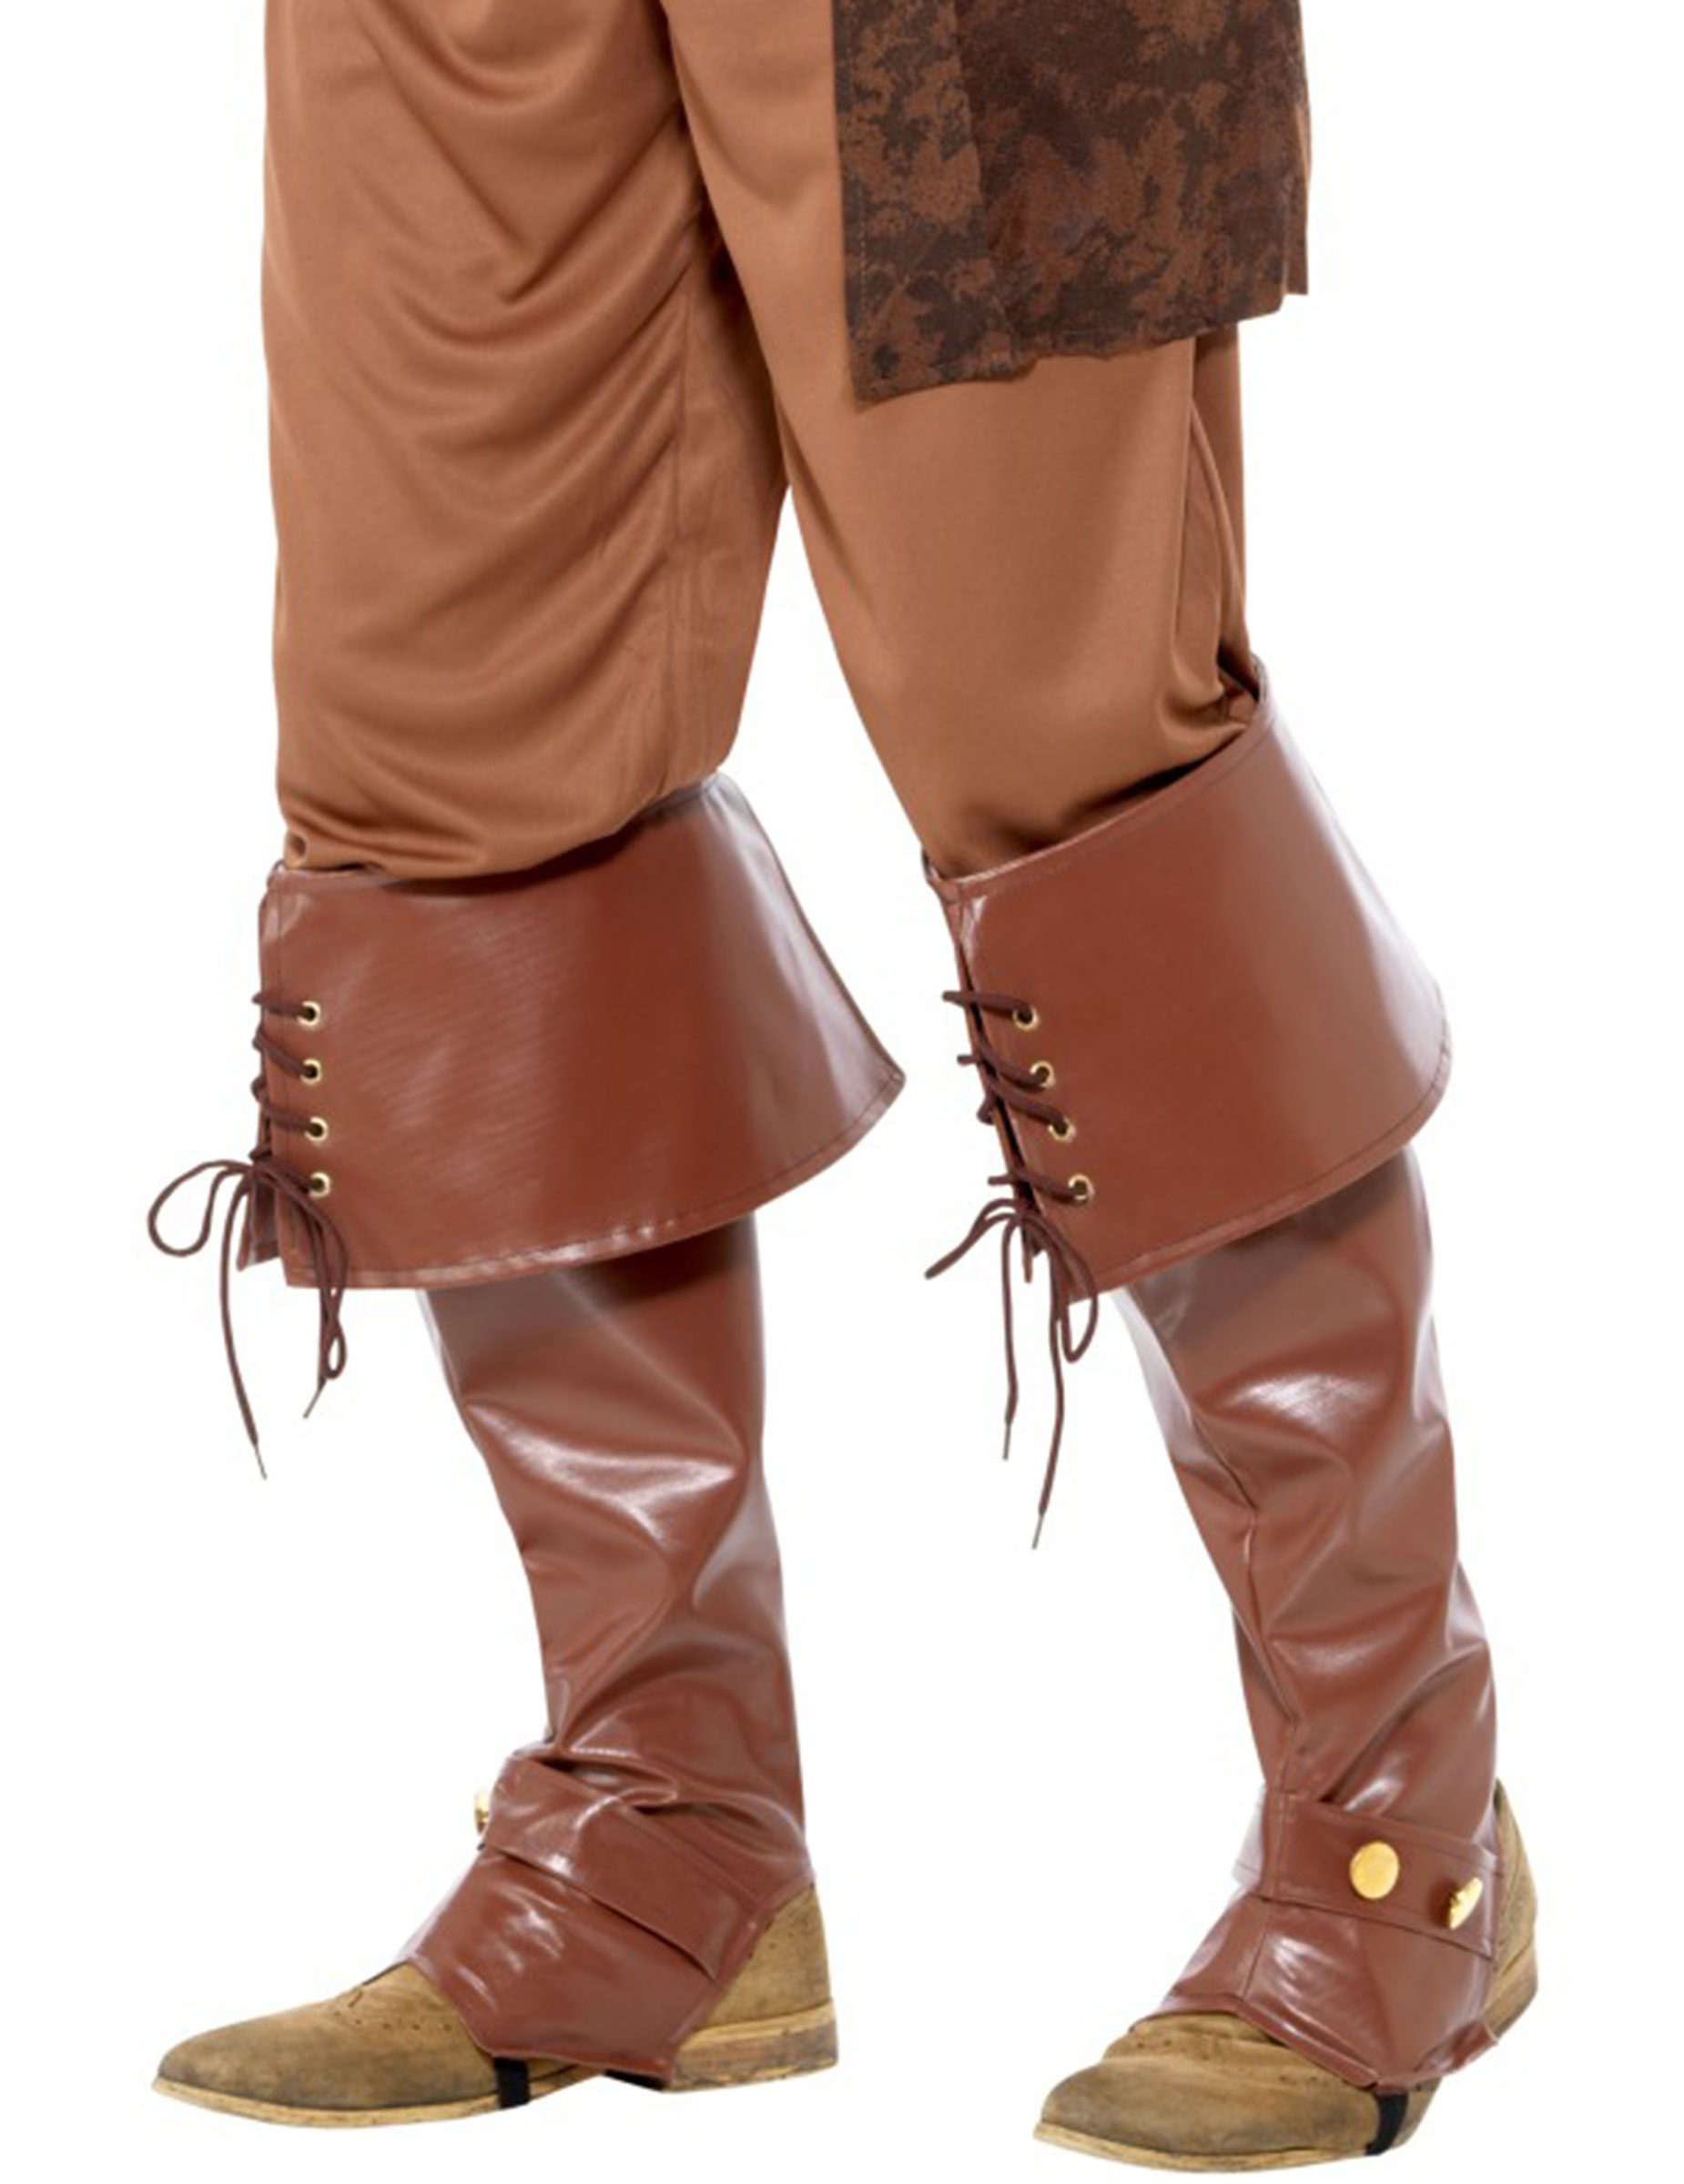 Braun Stulpen Braun Piraten Piraten Stiefel Stiefel Stulpen Stiefel Piraten Kostümaccessoire Stulpen Kostümaccessoire Ok80wnP